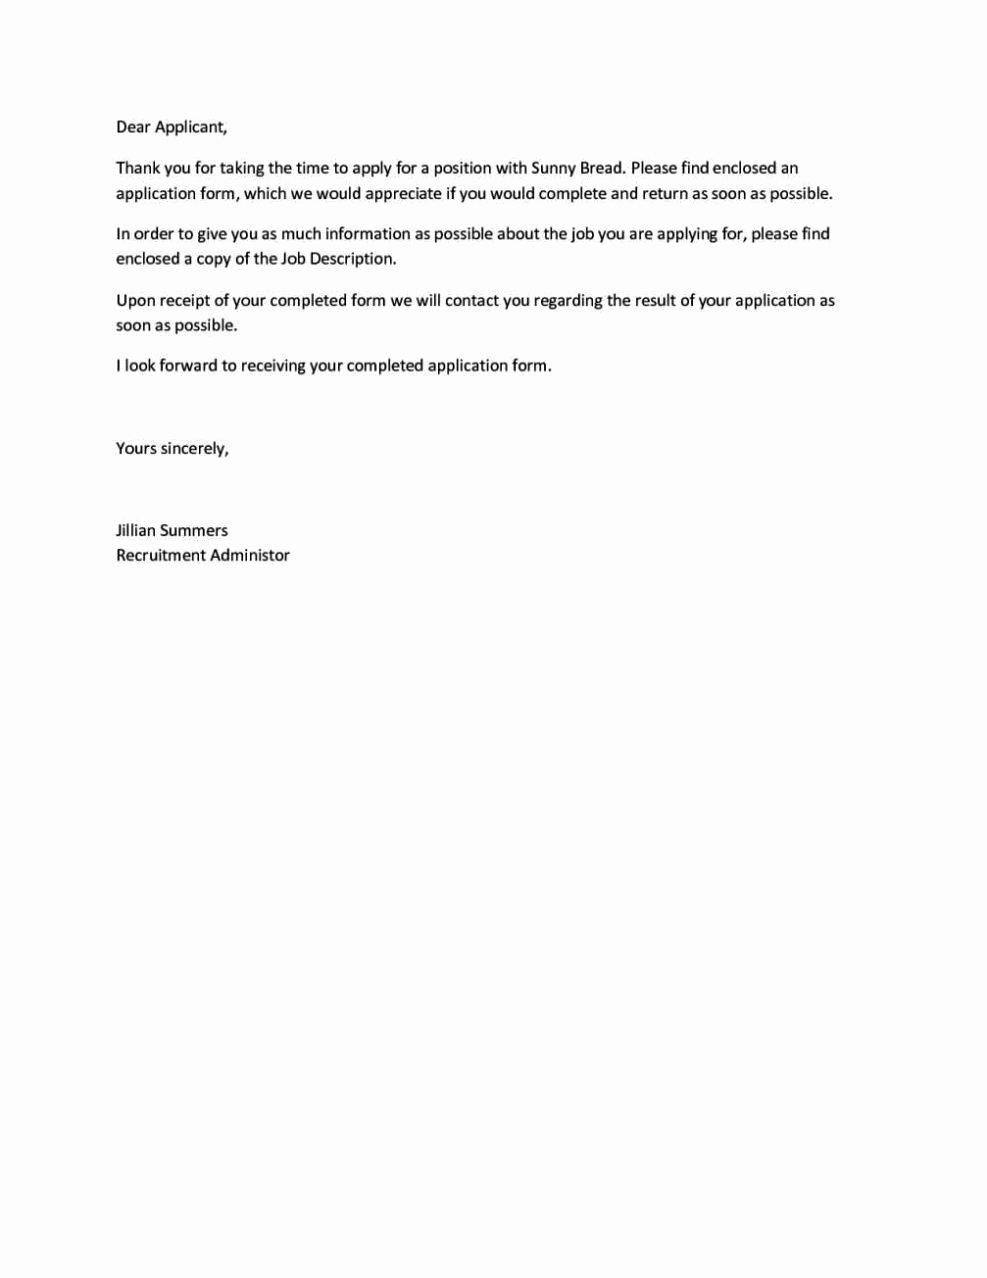 Job Application Follow Up Email Template